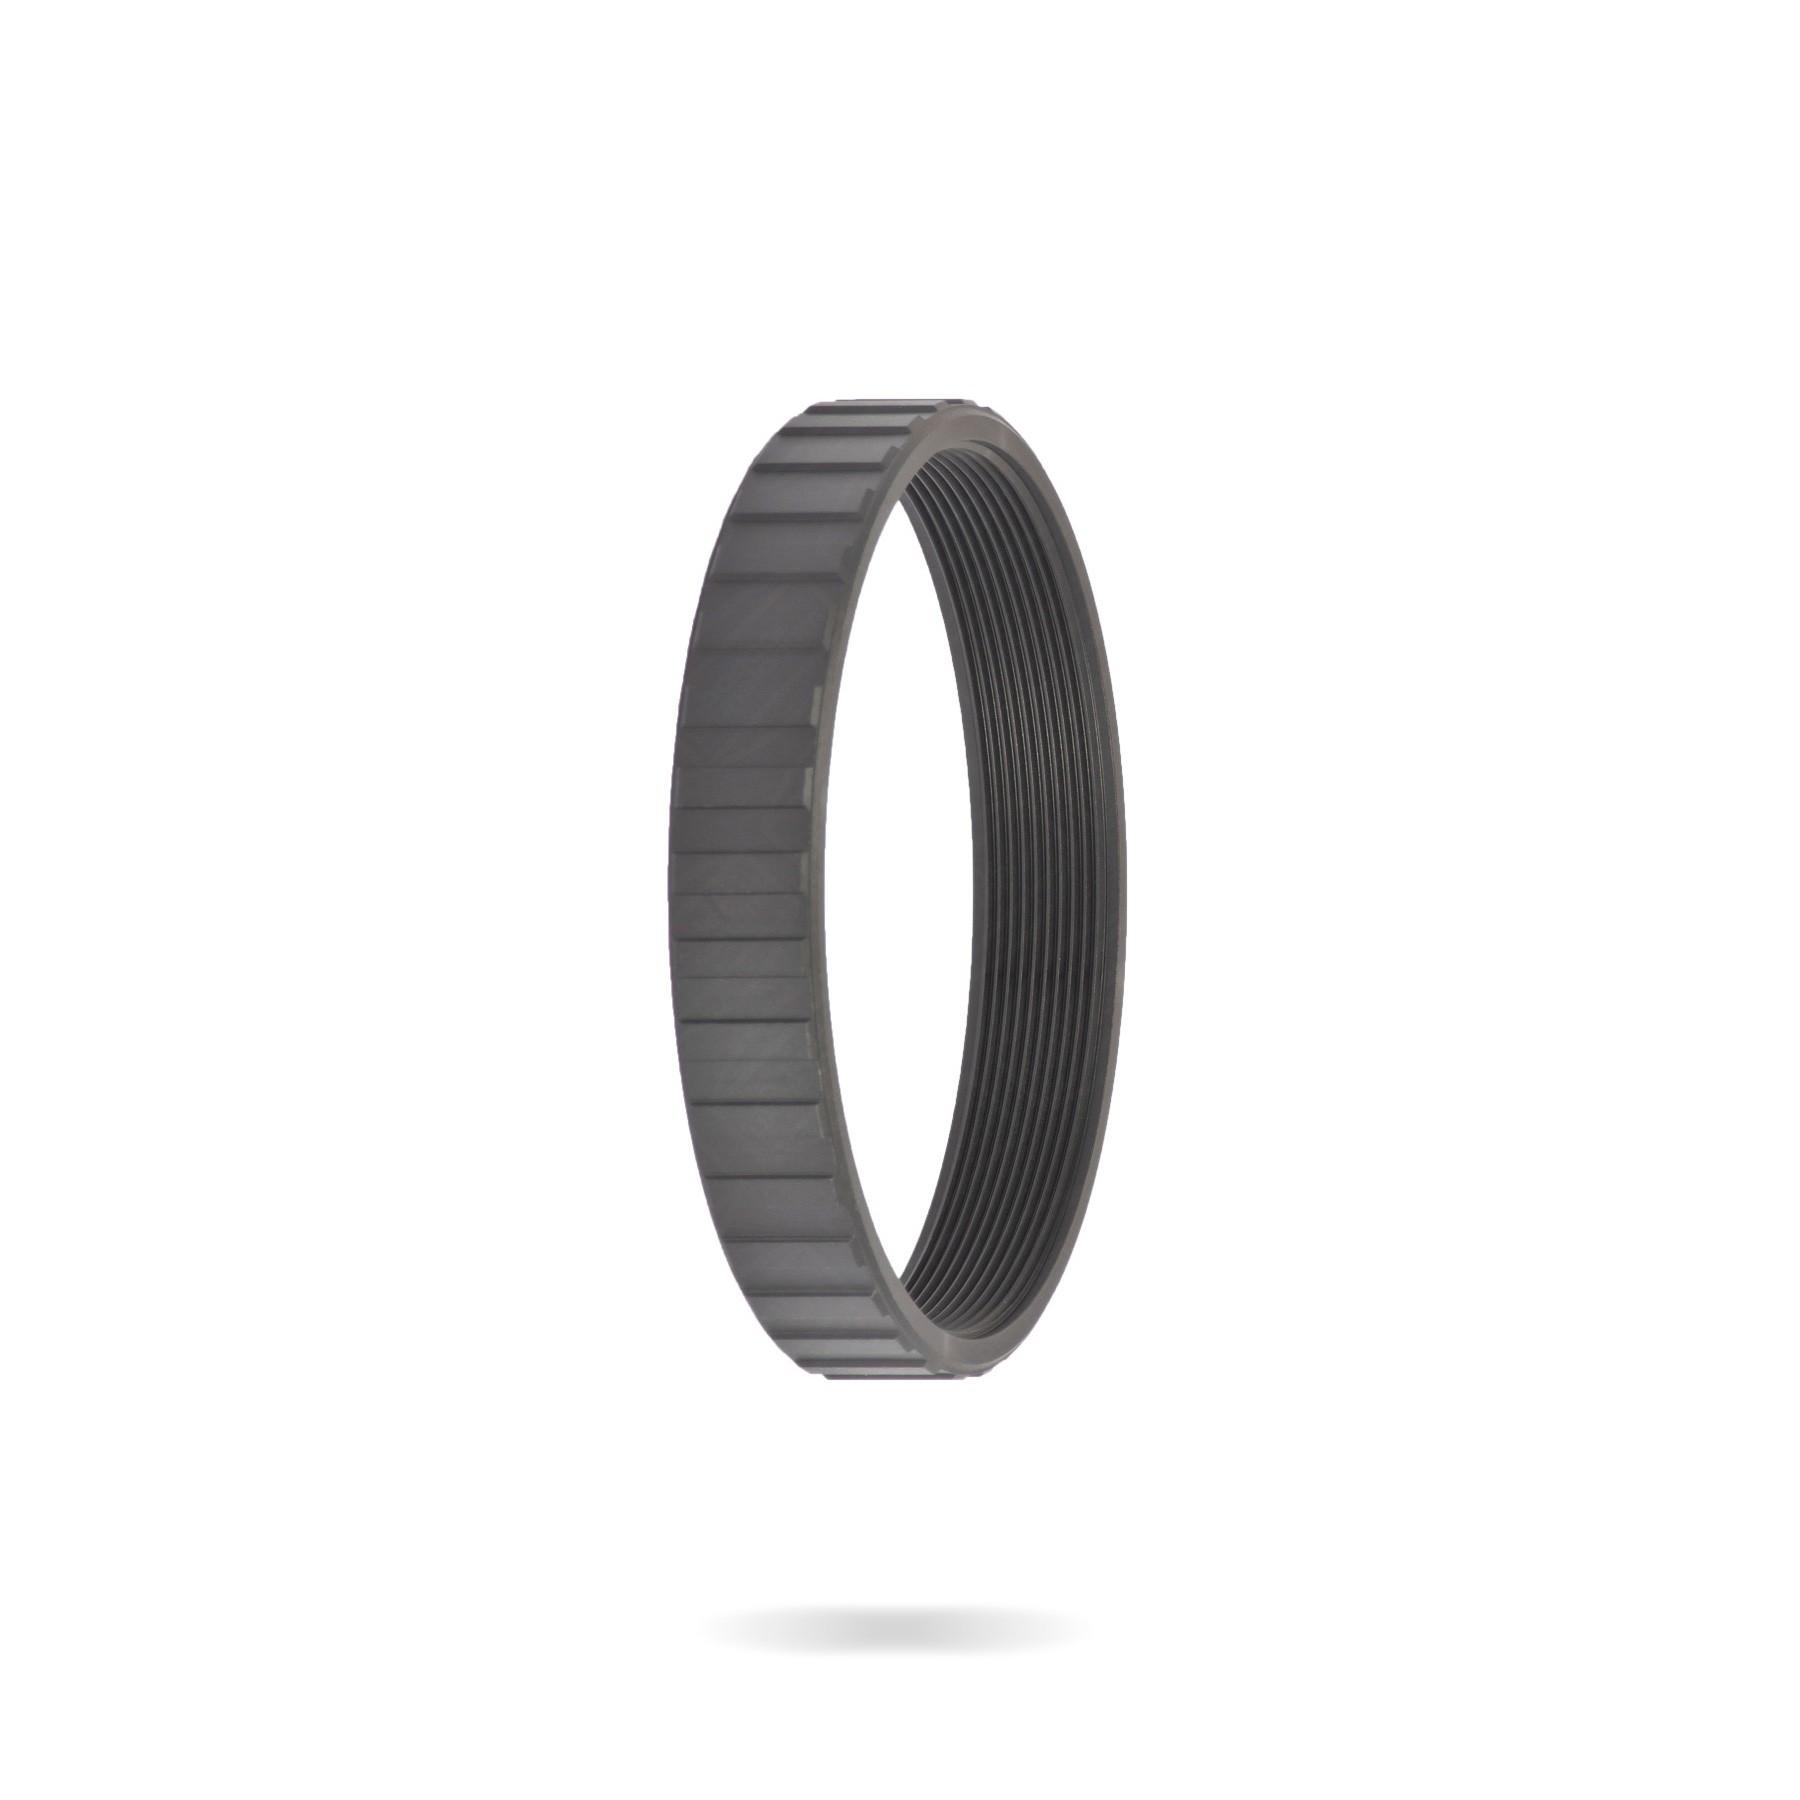 M68 Conversion Ring